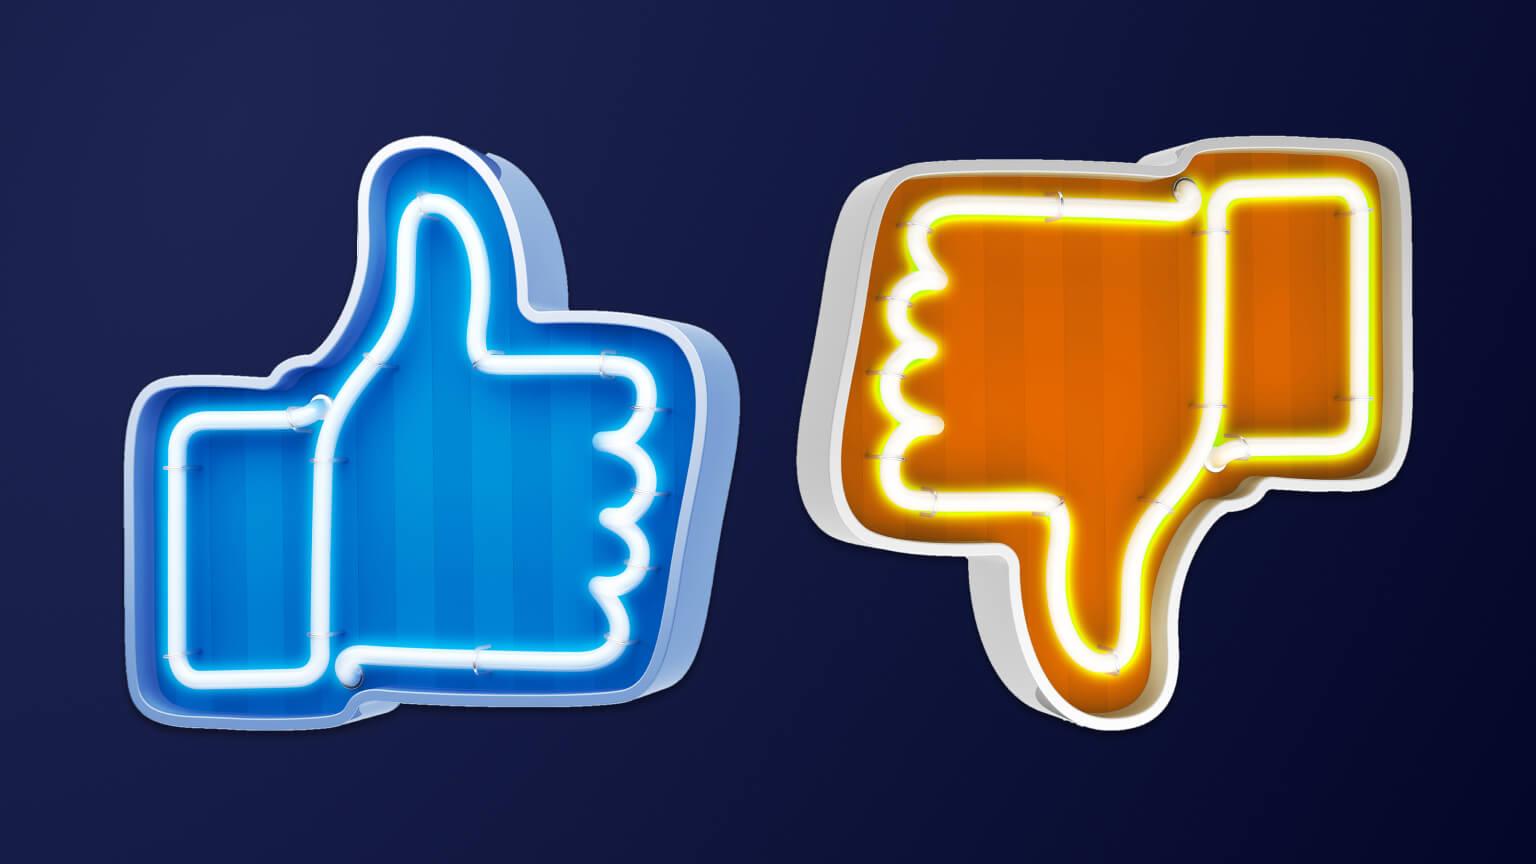 Social media like and dislike icons